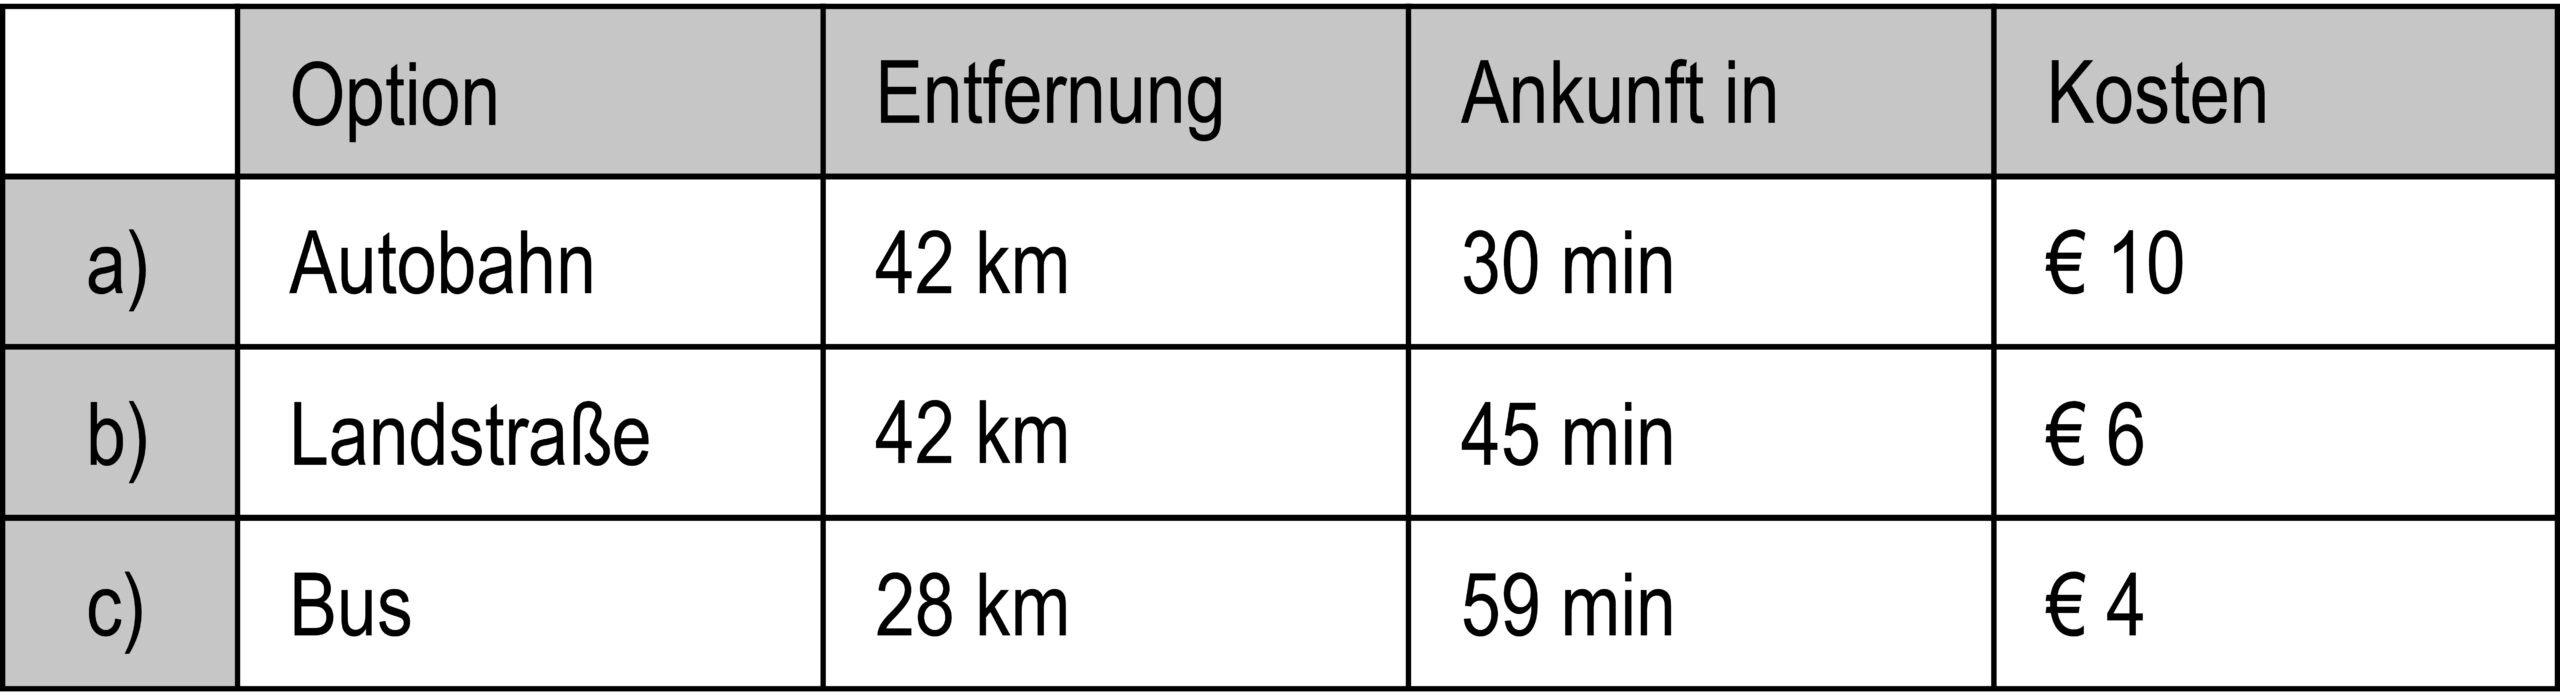 tabelle pruksch 3 scaled